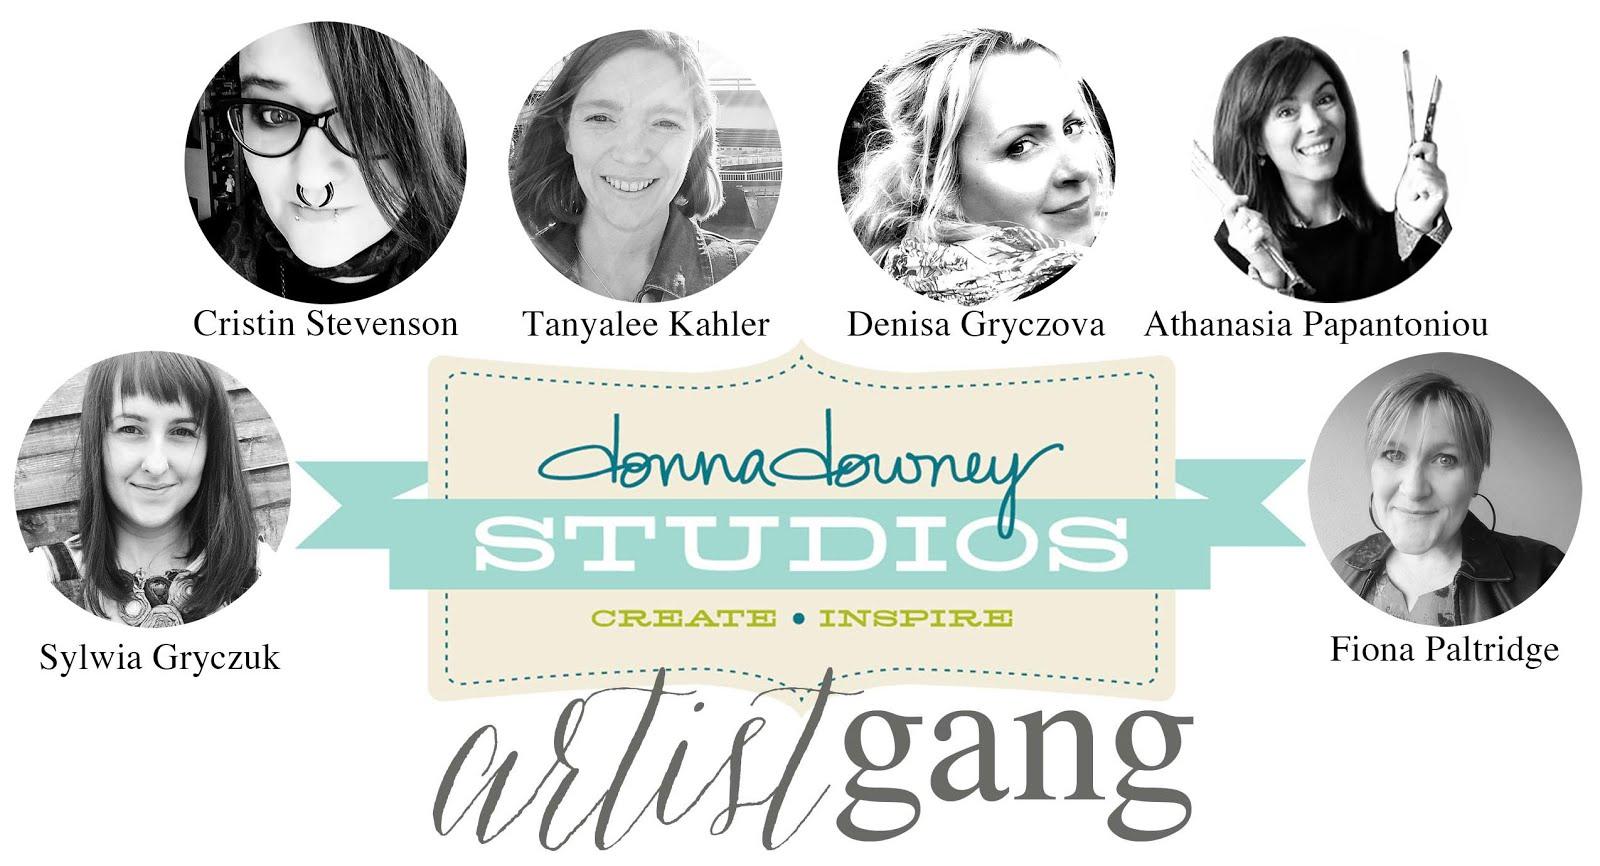 2017 Donna Downey Artist Gang Member